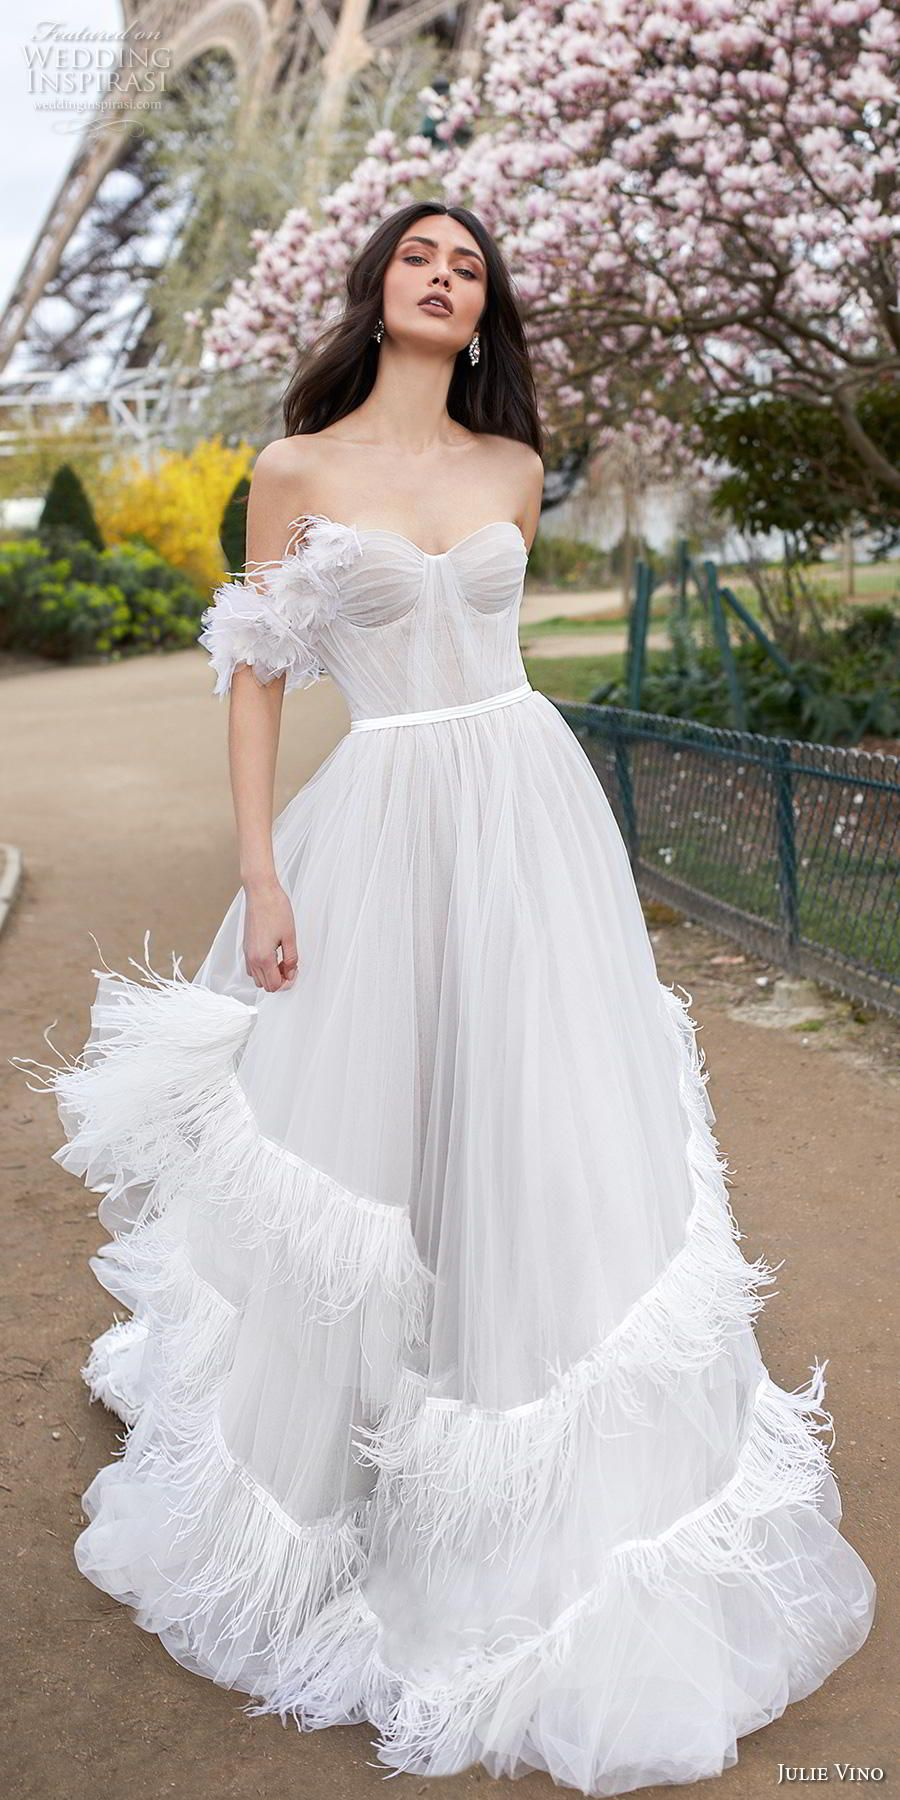 Julie Vino 2019 Wedding Dresses Paris Bridal Collection Wedding Inspirasi Wedding Dresses Unique Julie Vino Wedding Dress Strapless Wedding Dress Sweetheart [ 1800 x 900 Pixel ]